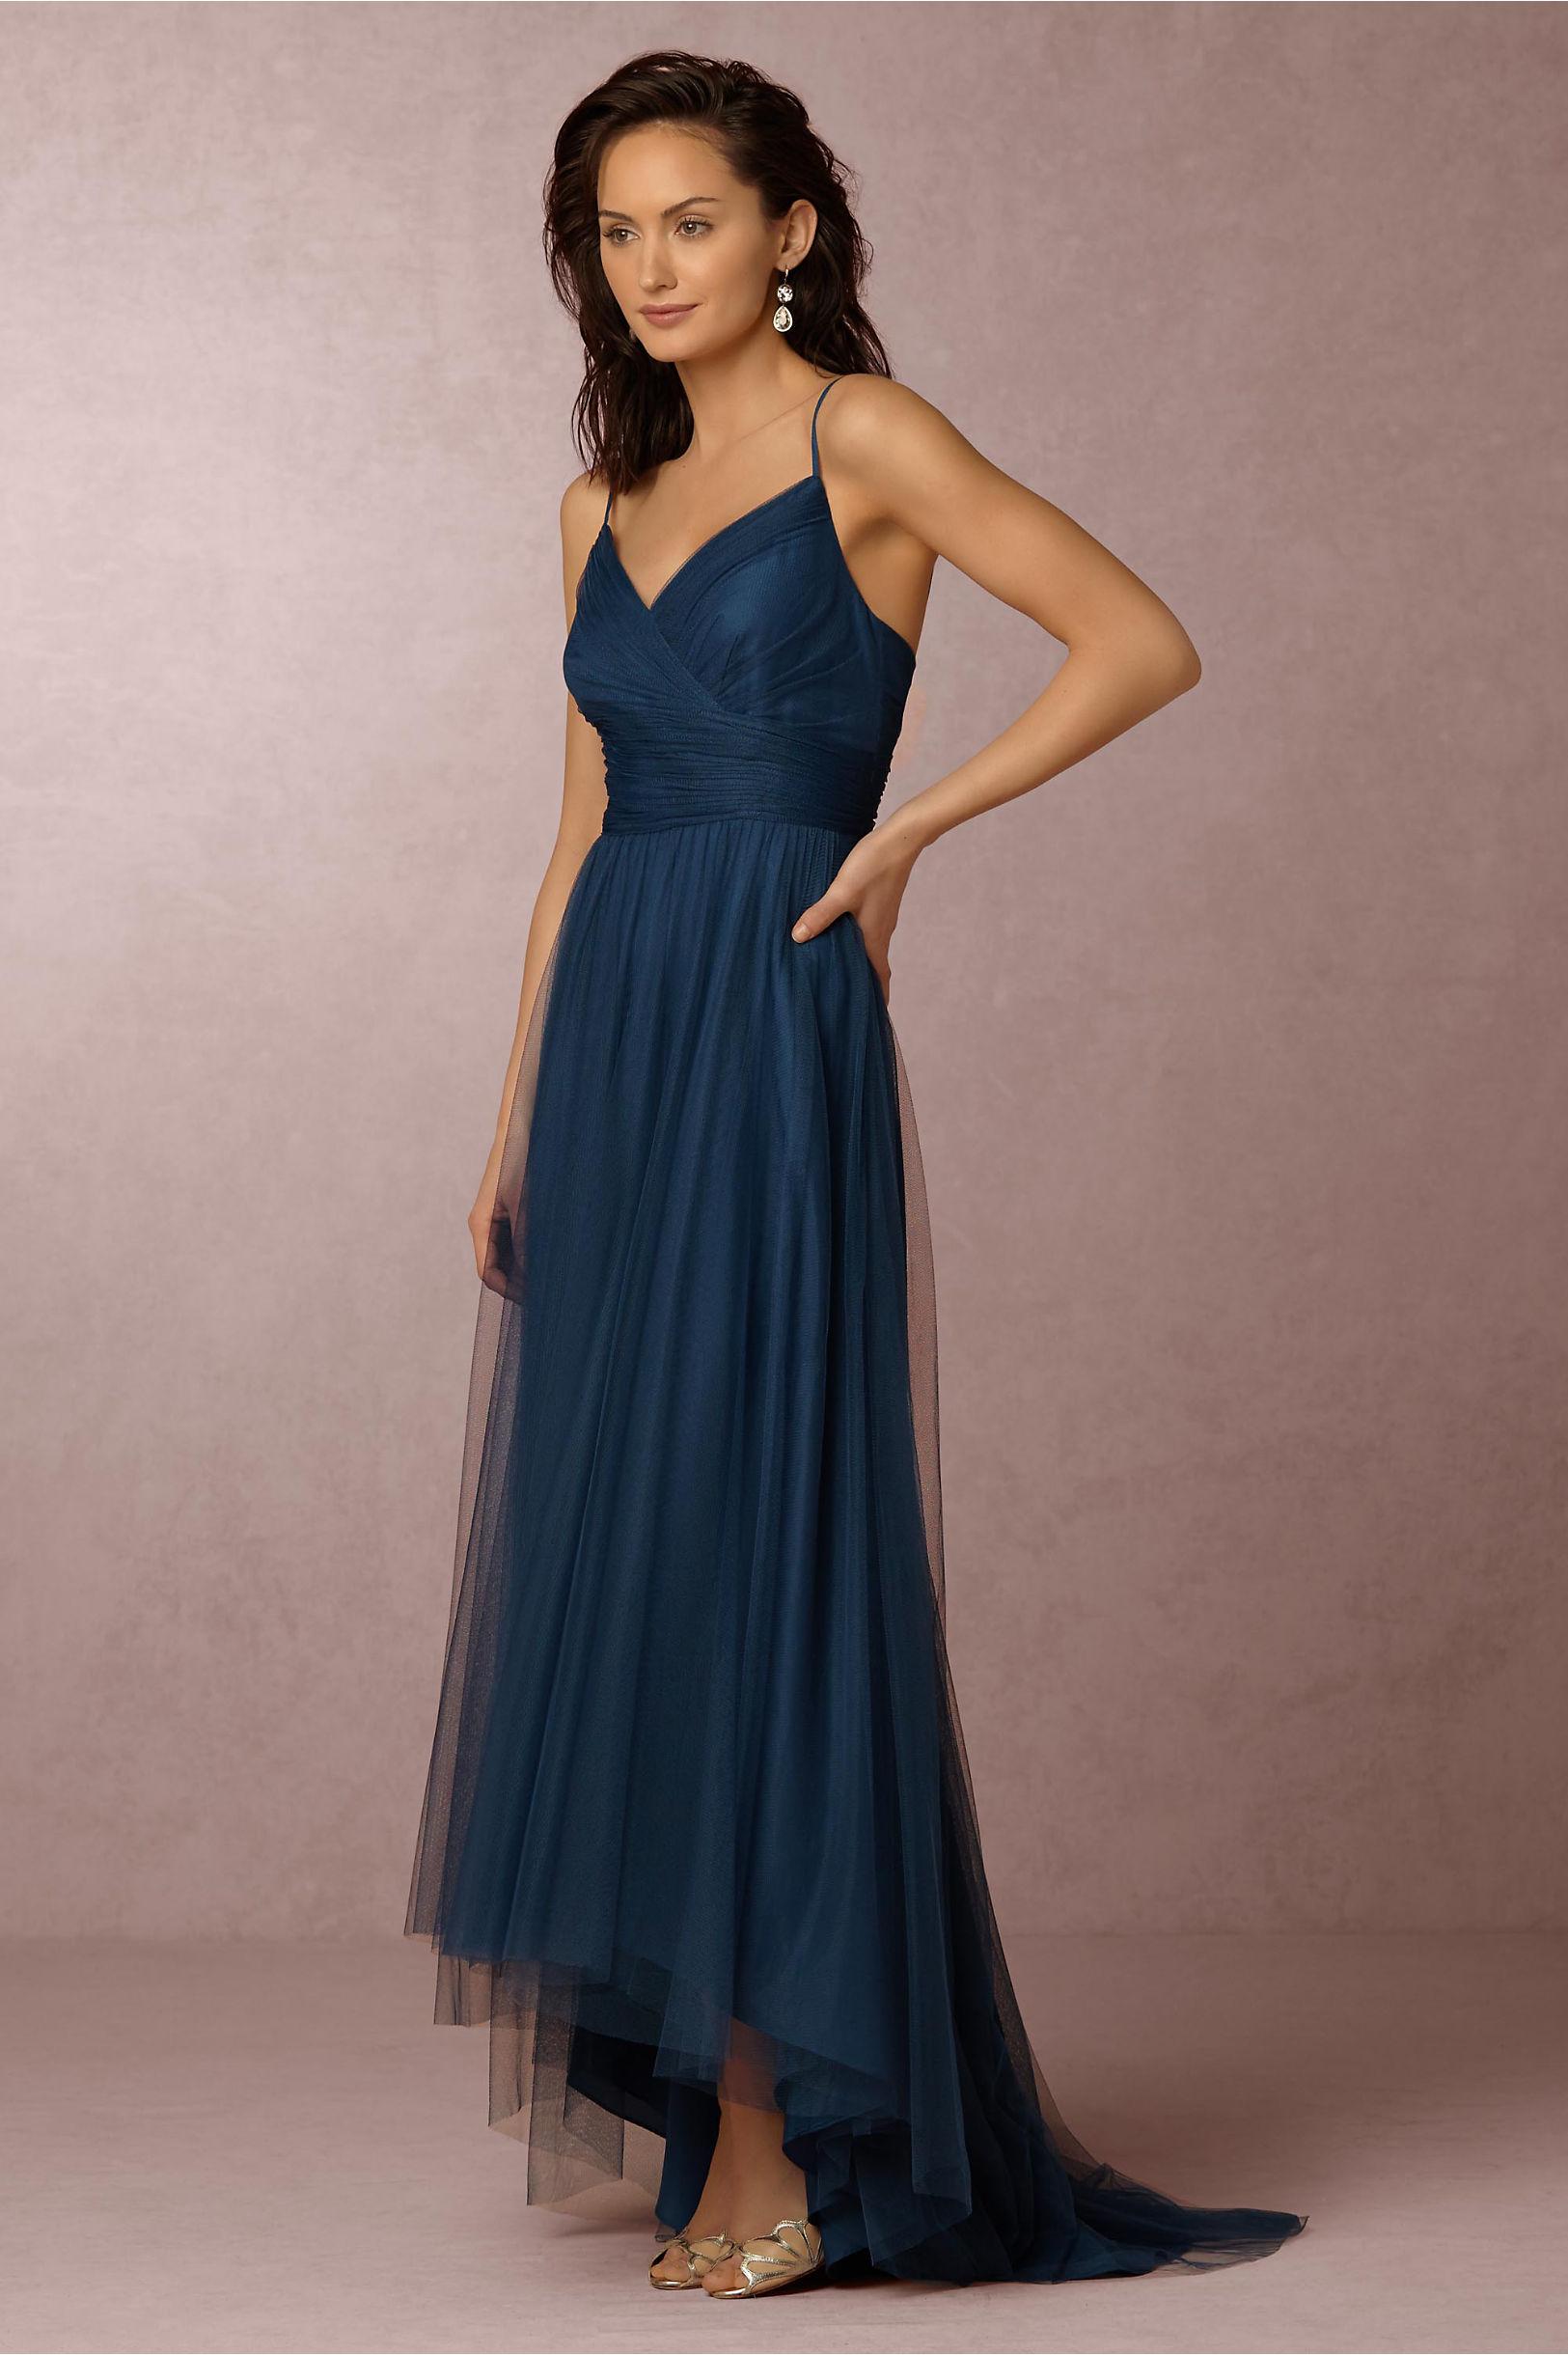 Brinkley dress in bridal party bhldn monique lhuillier event lapis brinkley dress bhldn ombrellifo Images